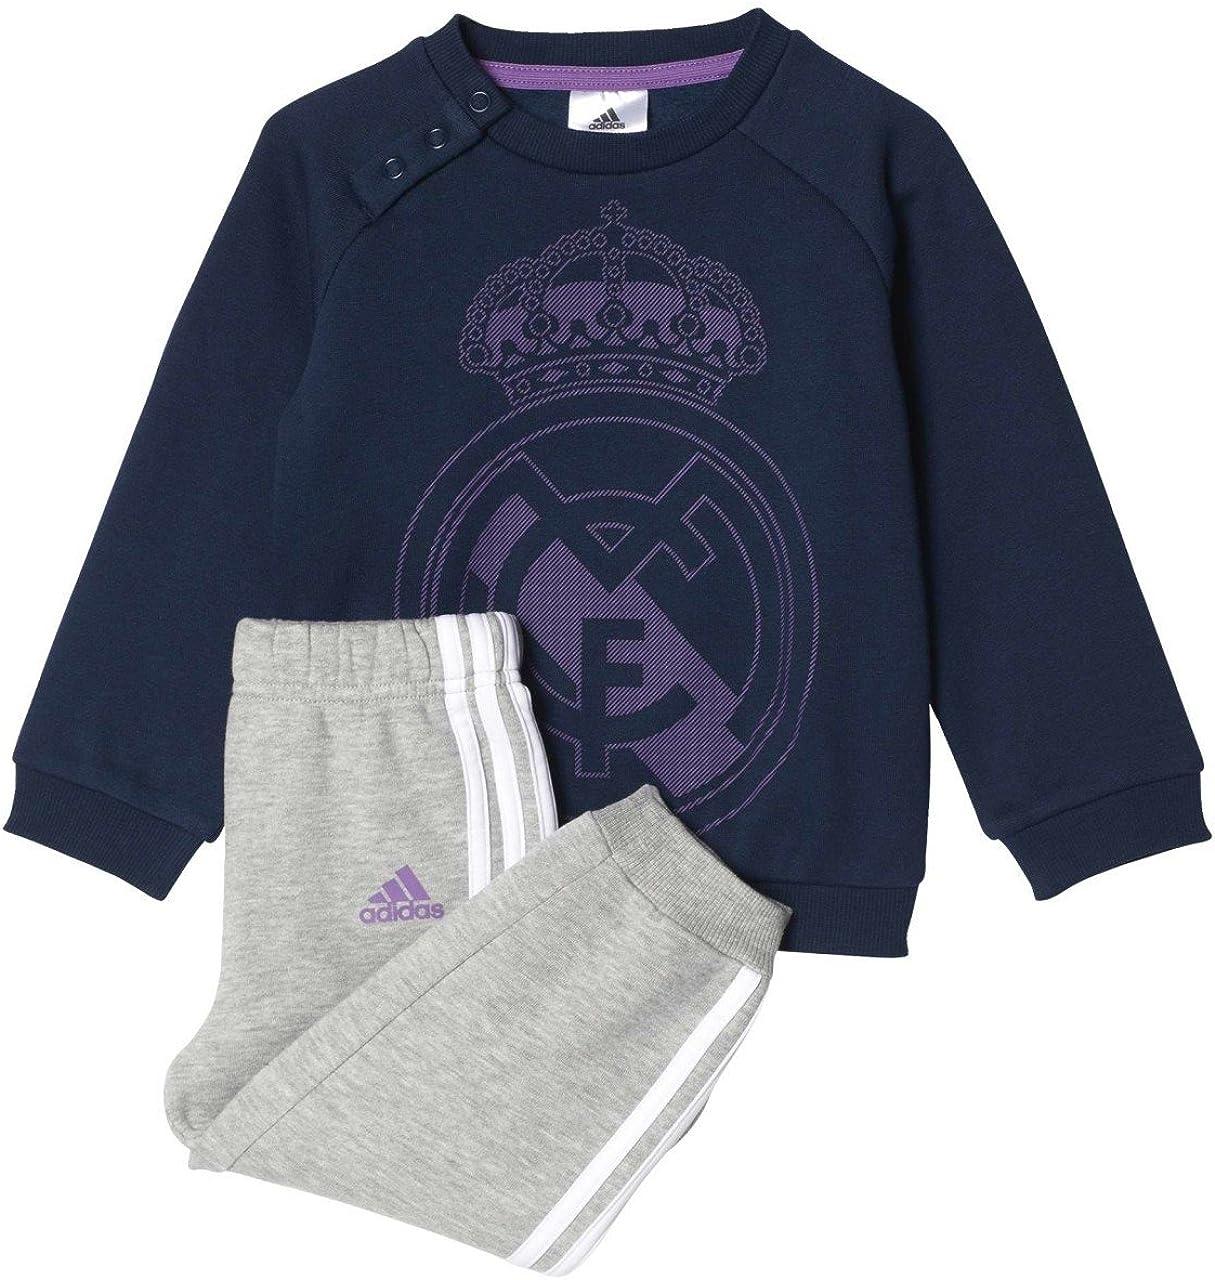 Regenerador Universidad Conductividad  Niños adidas I Real Jogger Pantalones de Chándal Pantalones